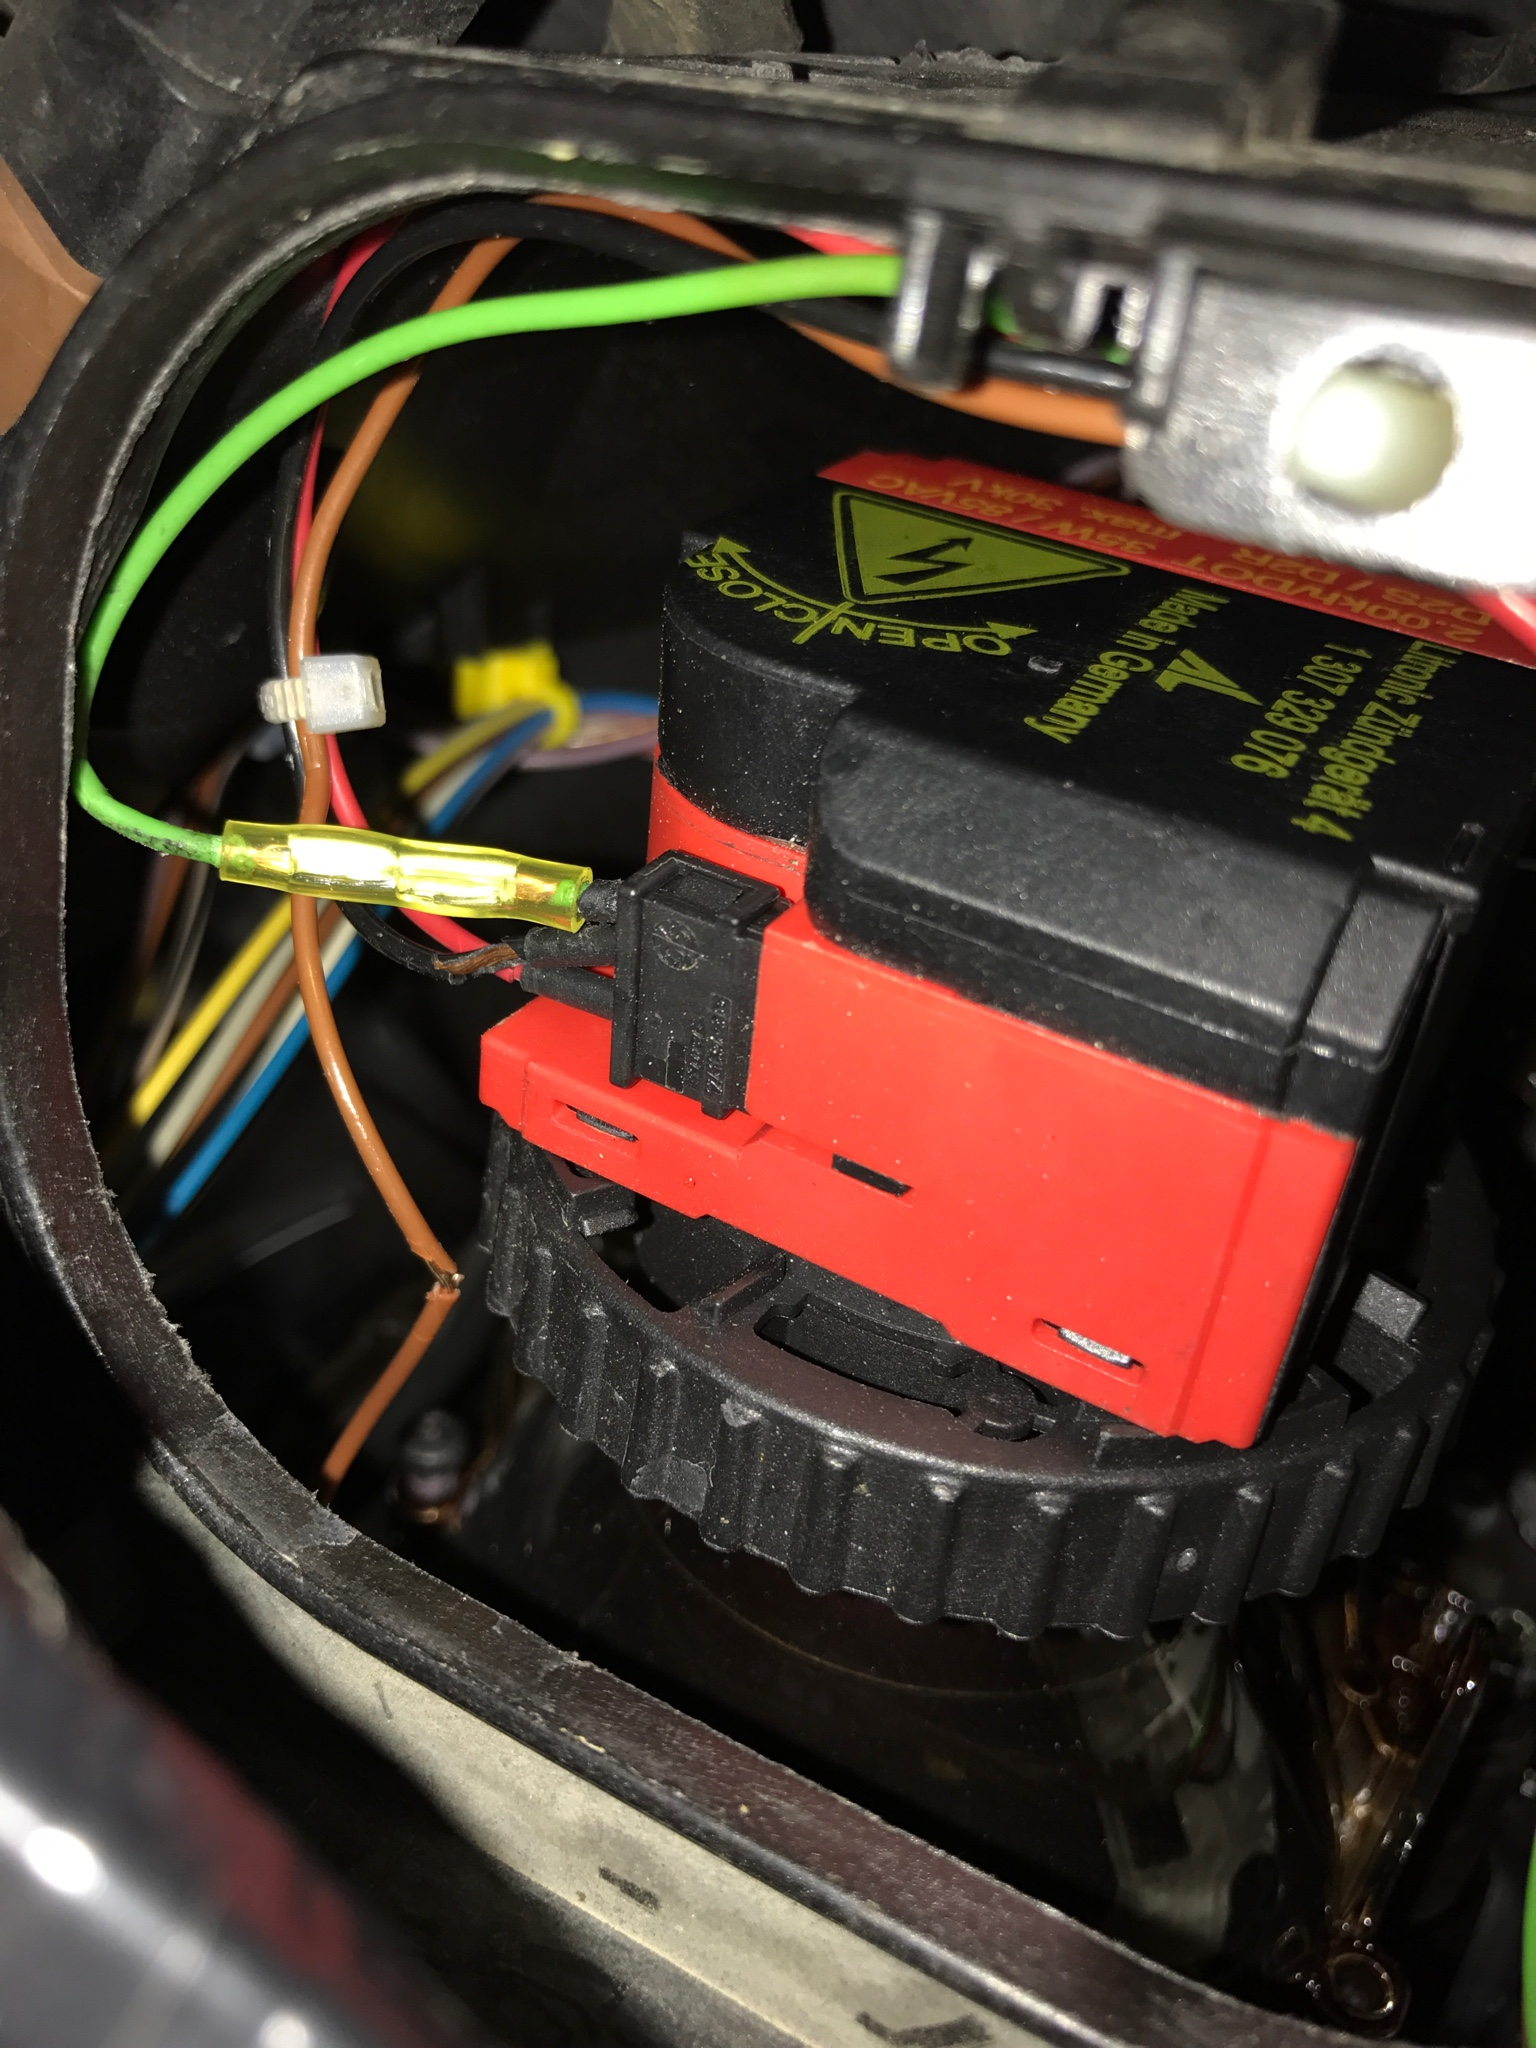 Adaptive Bi-Xenon Headlights Blinking/Flickering - Solution For One